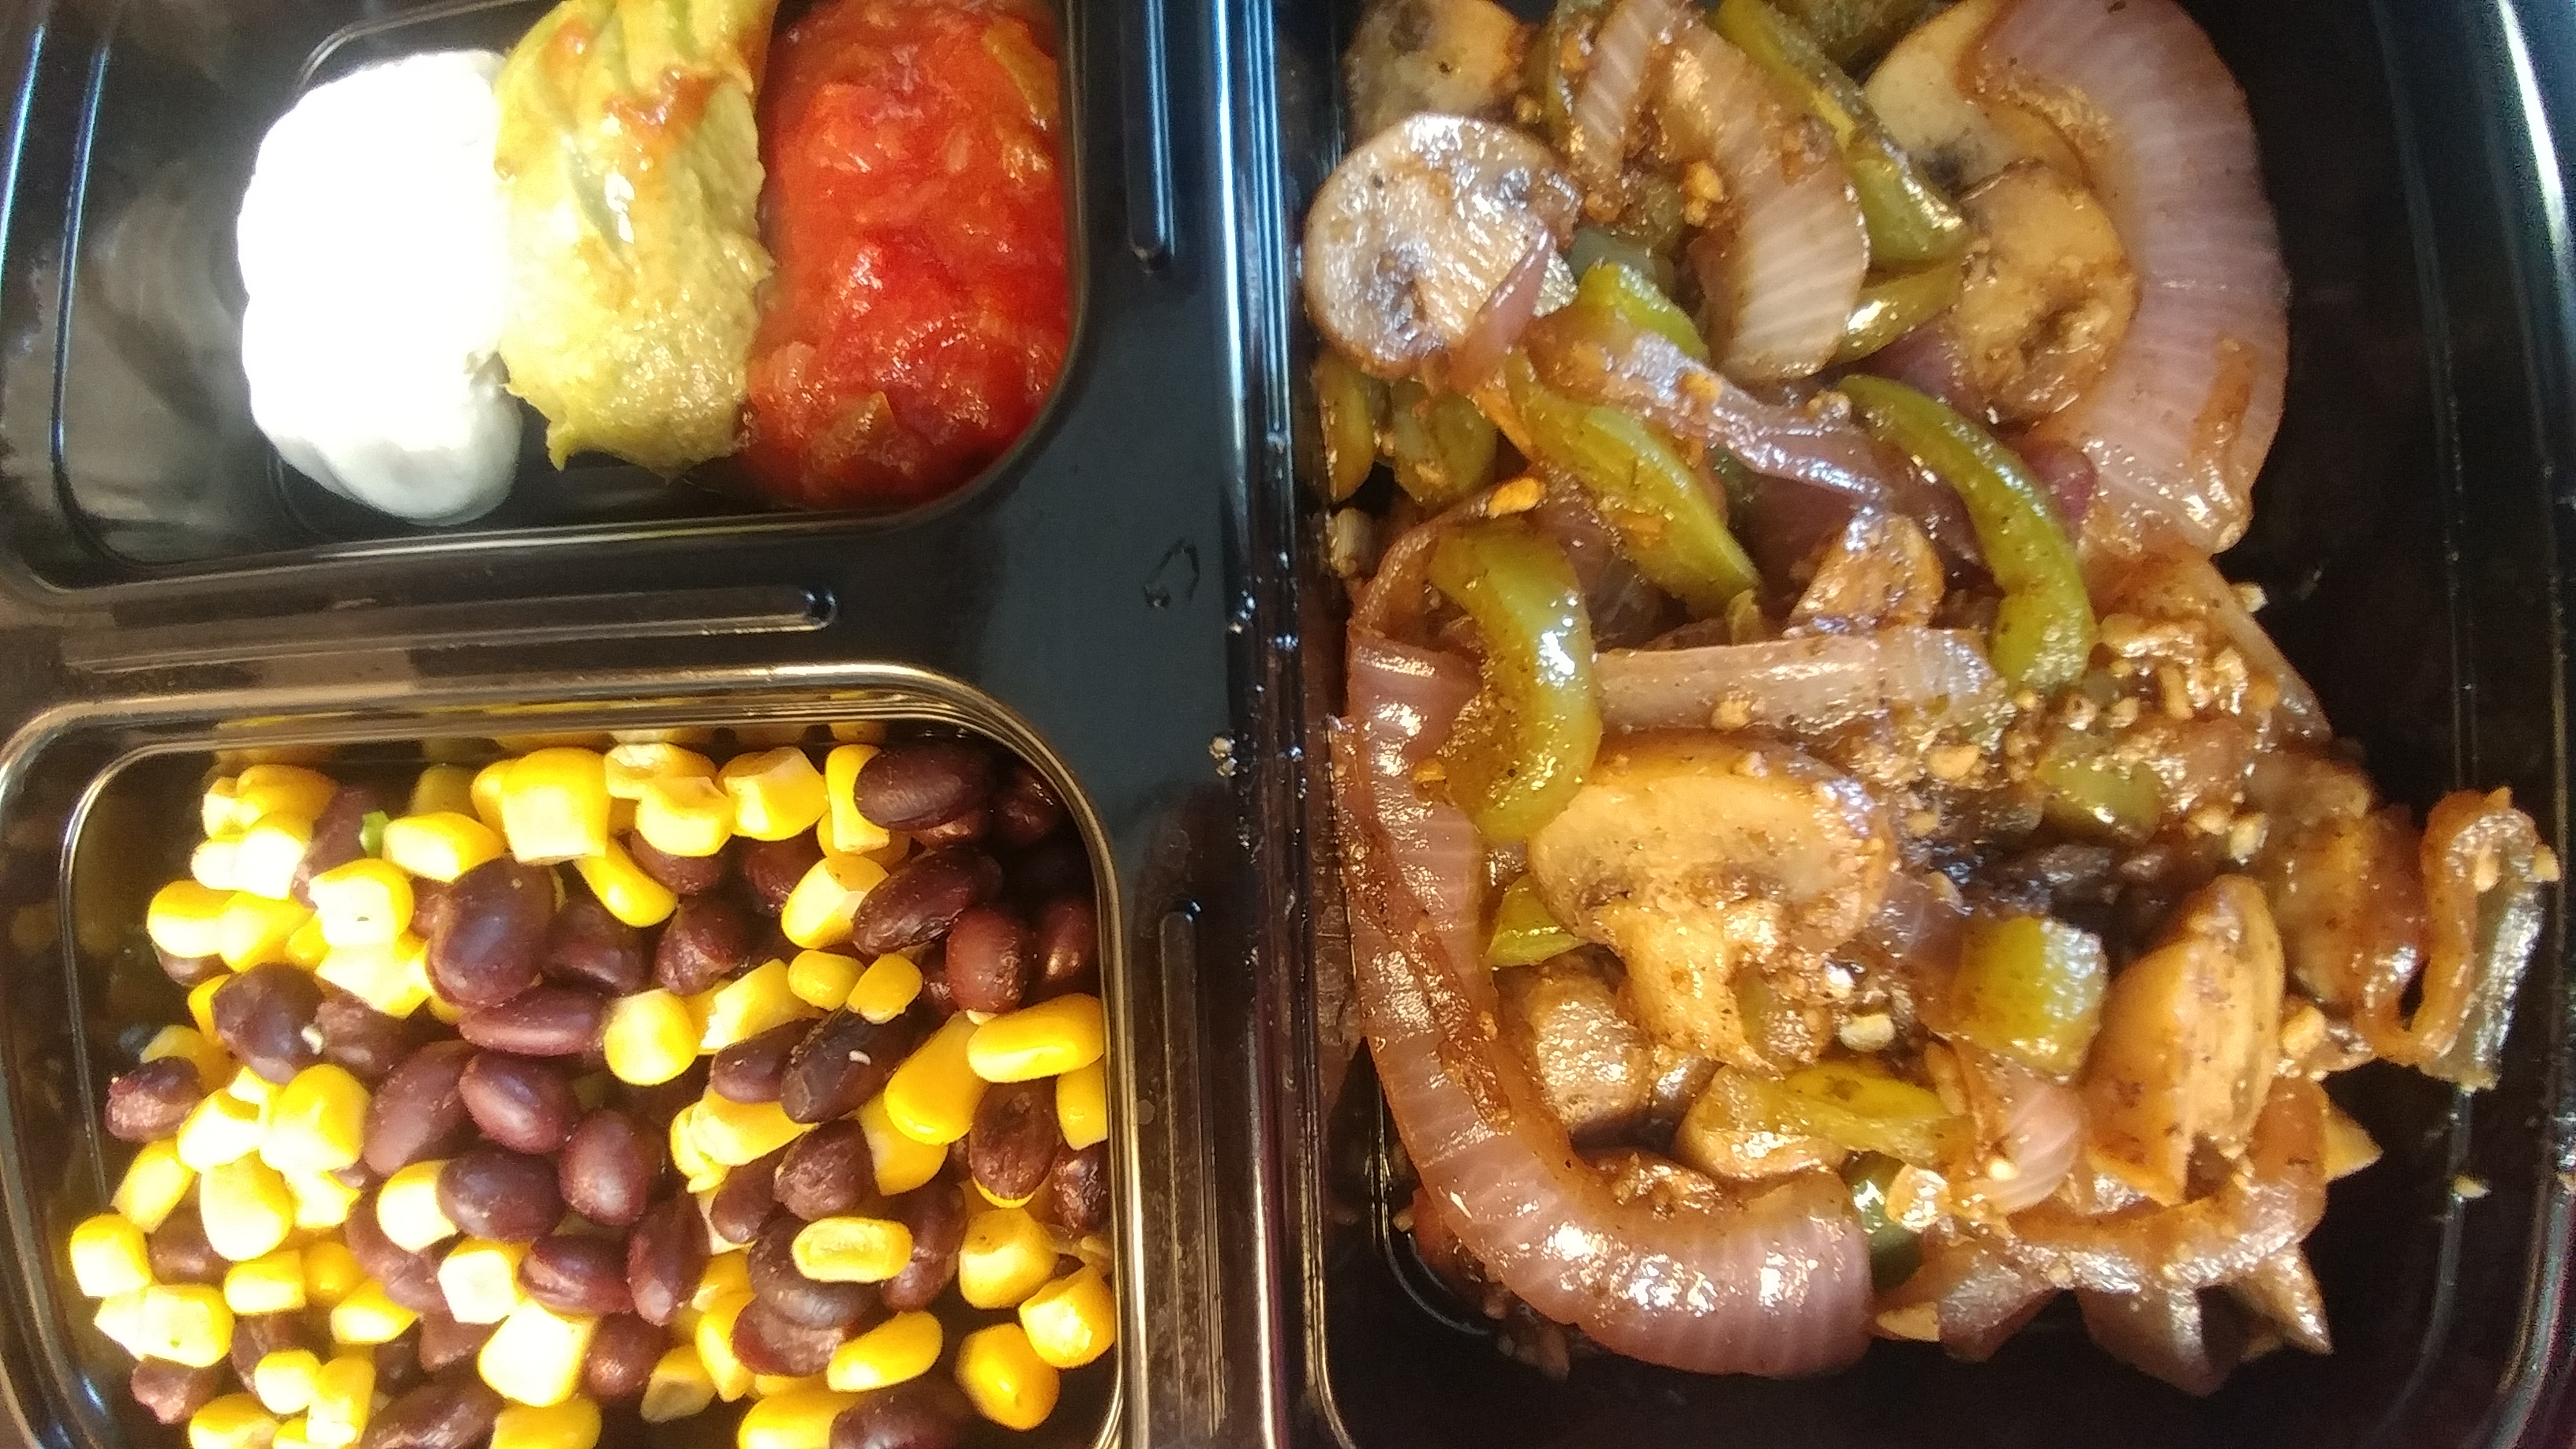 veggie fajita bowls family friendly low carb lunch prep ideas